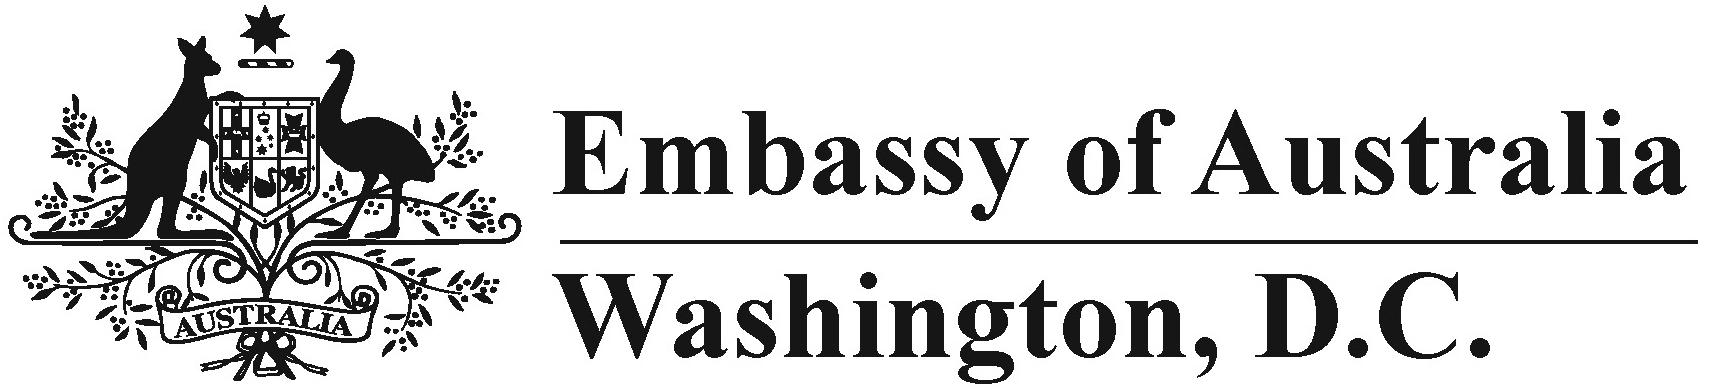 Embassy of Australia, Washington, D.C.